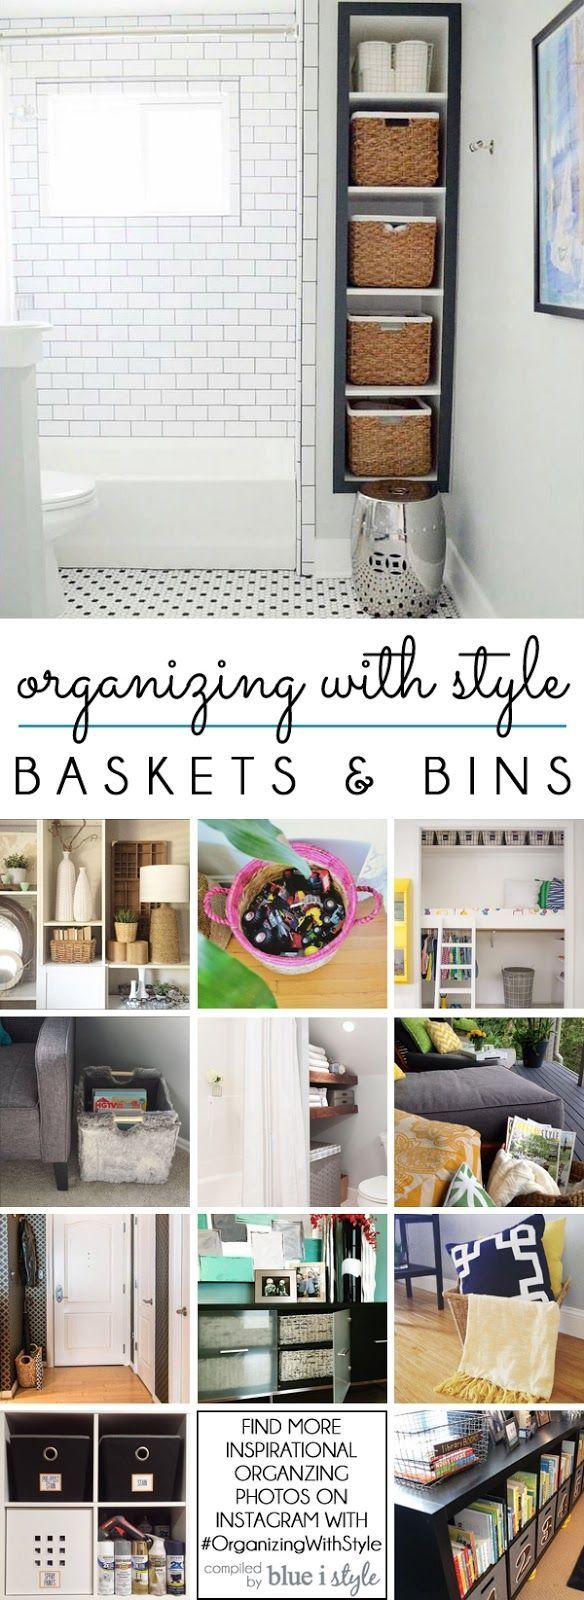 organizing with style} 12 Ways to Organize with Baskets & Bins ...